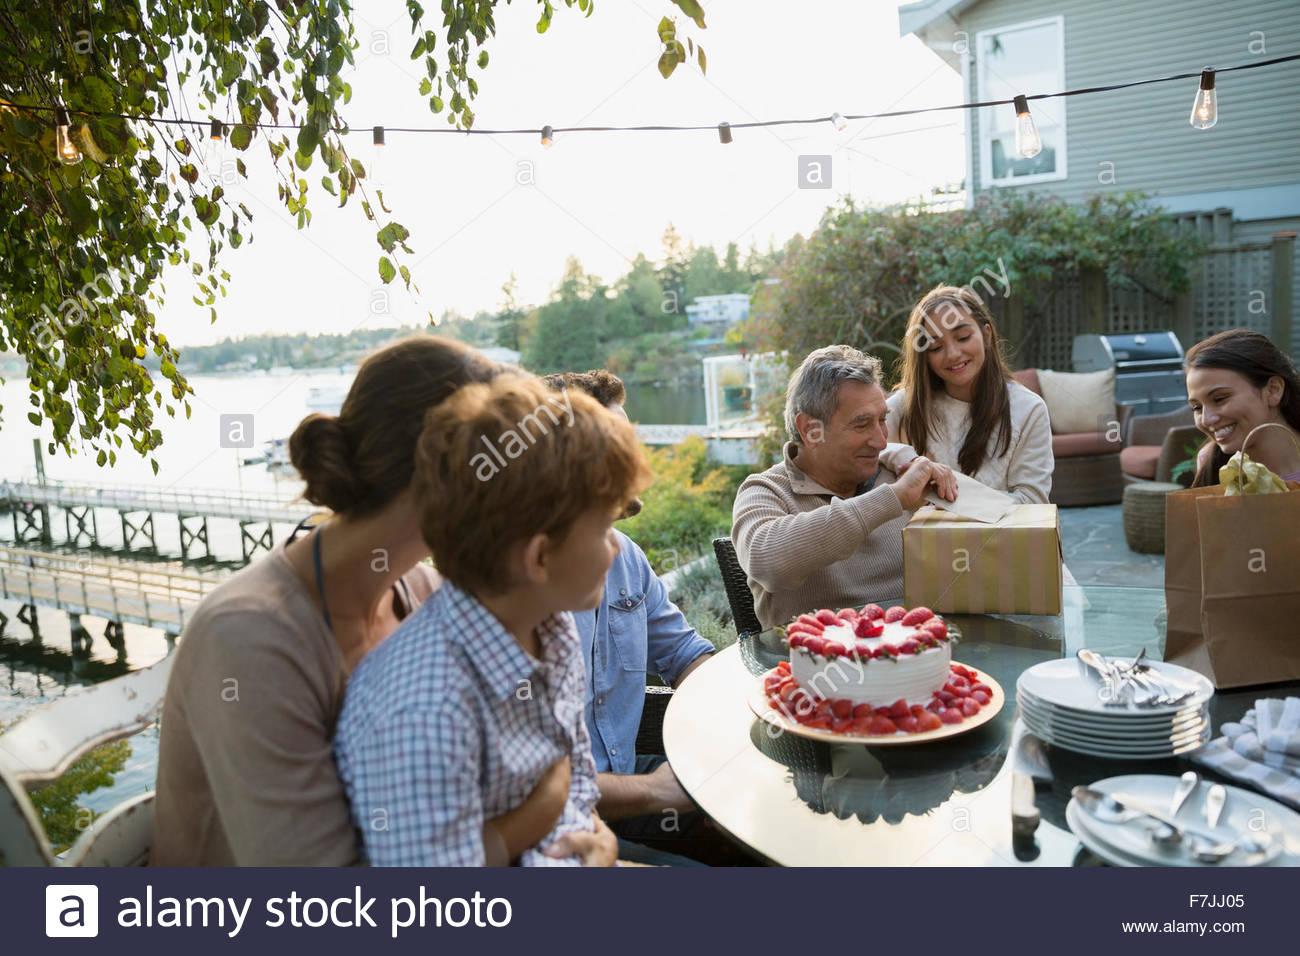 Senior man opening birthday gifts family lakeside patio - Stock Image